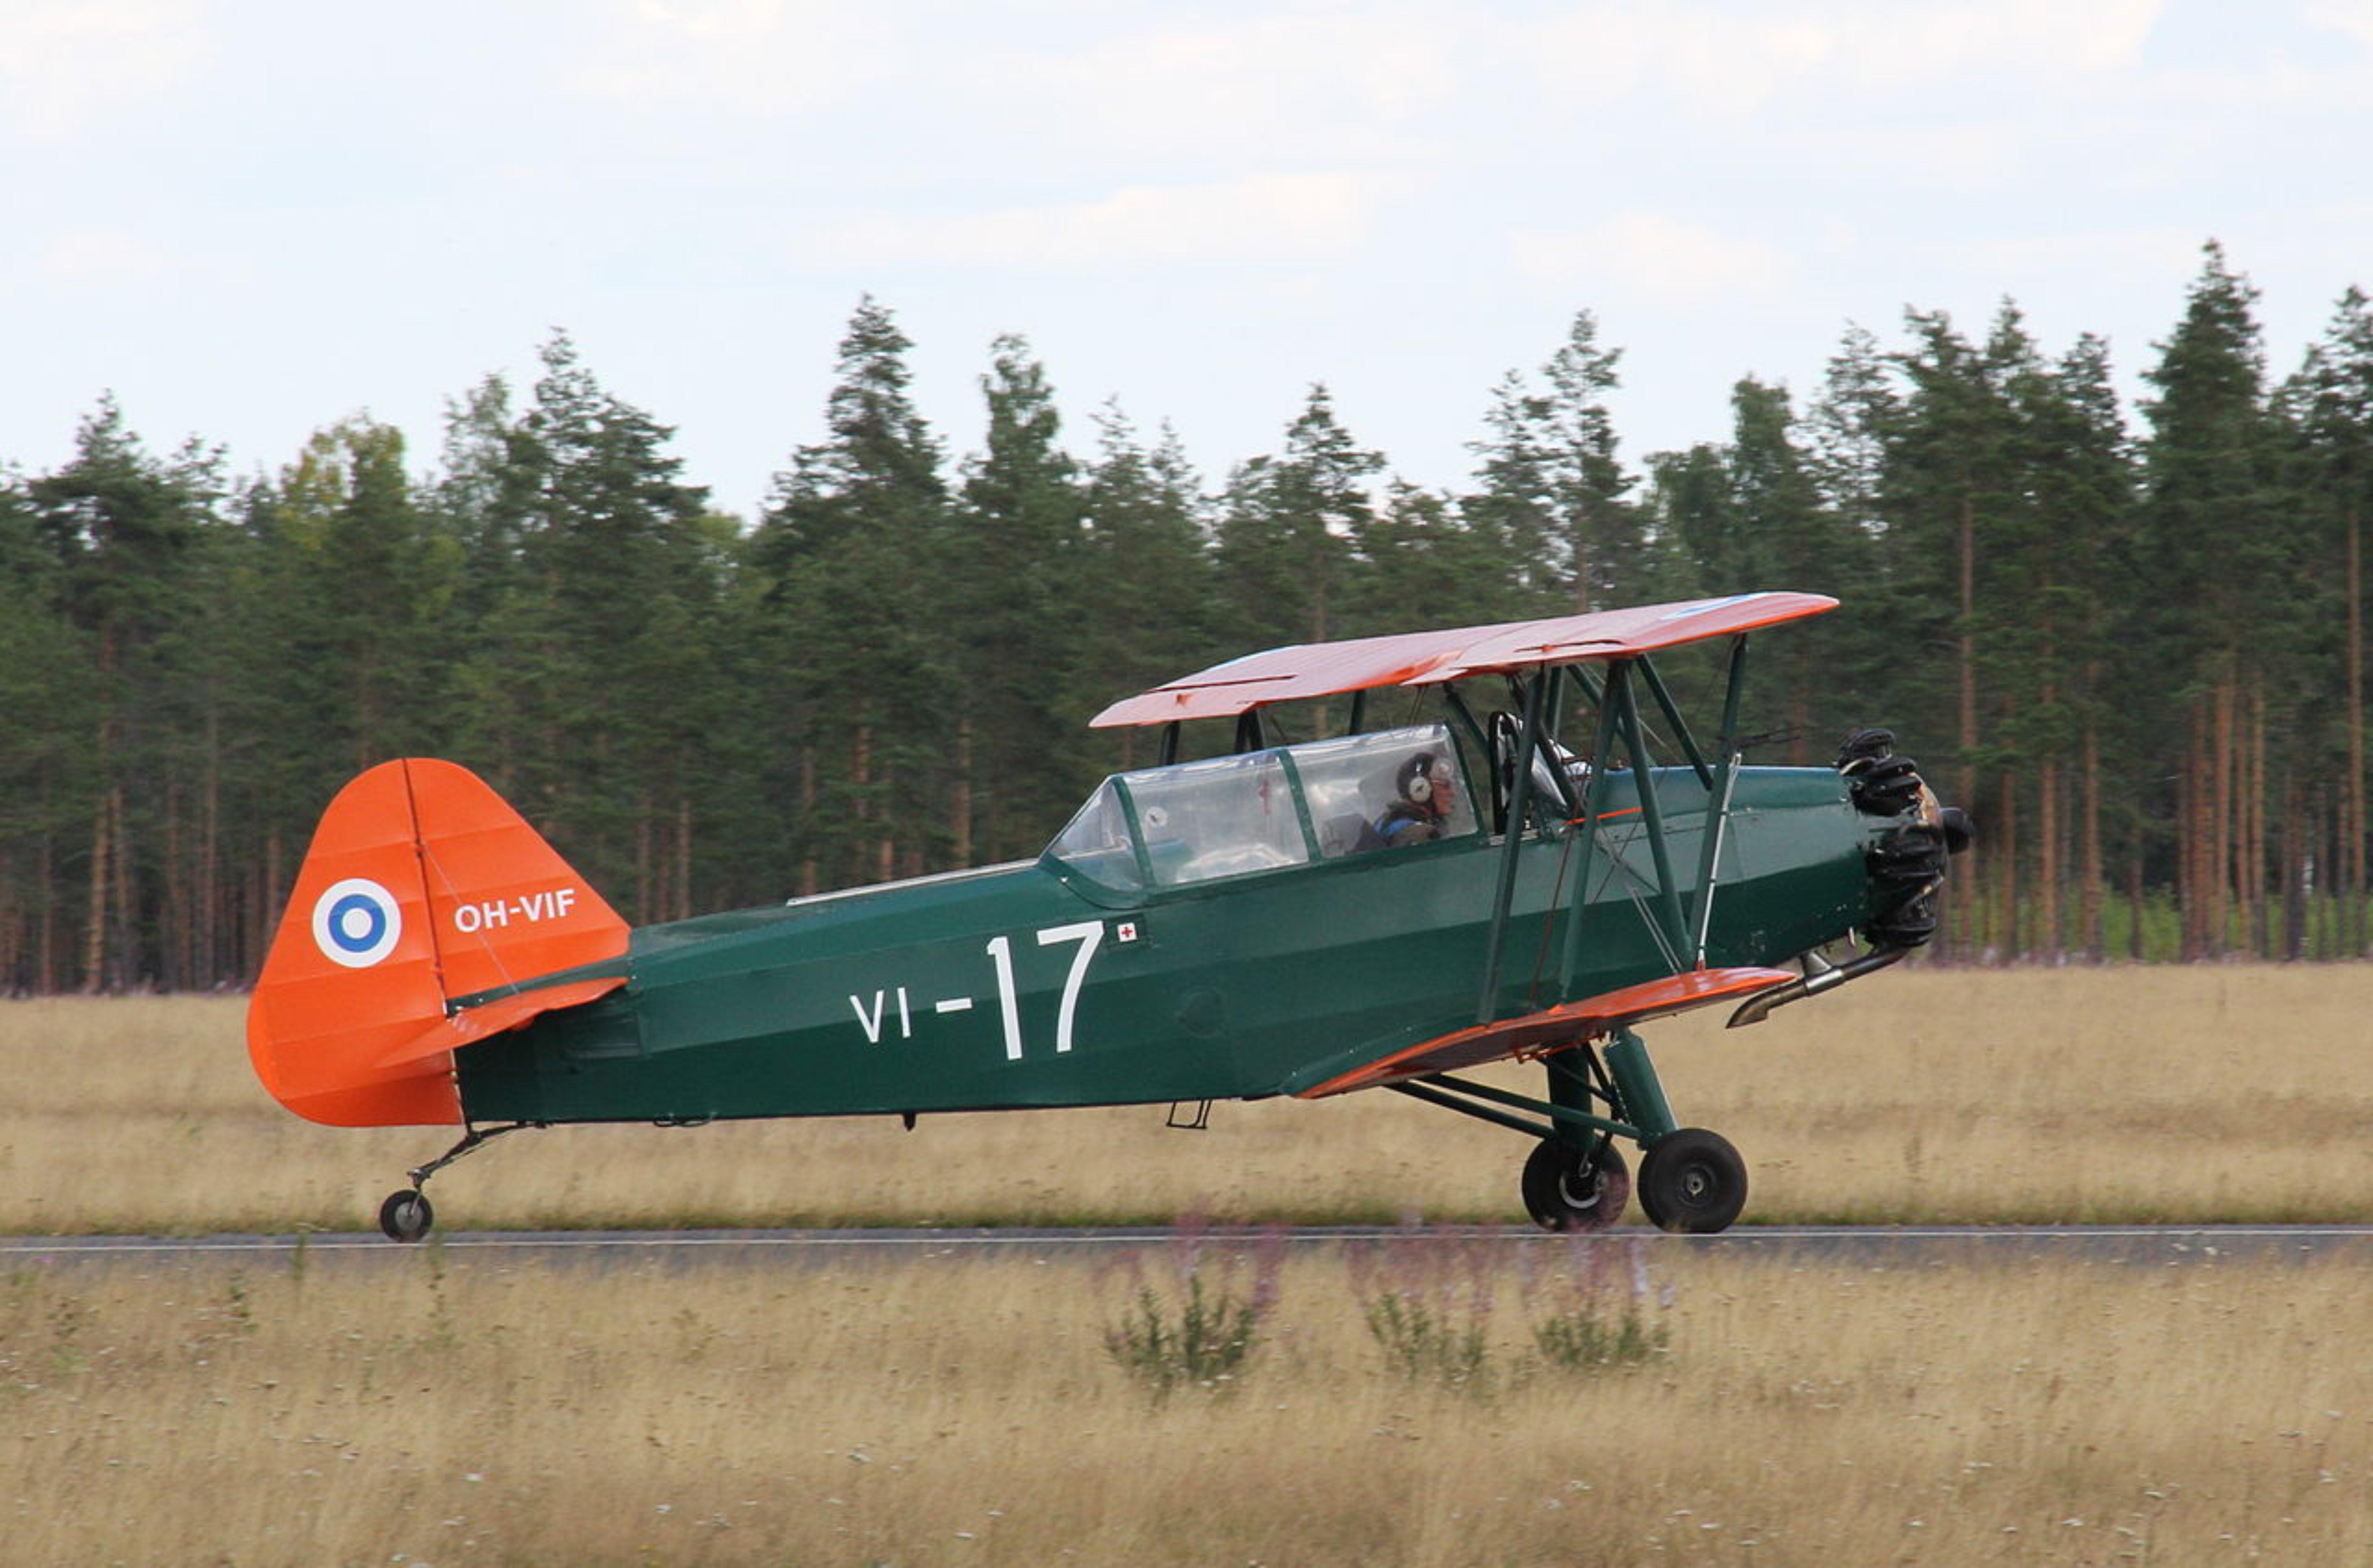 A Vilma II biplane on the ground.